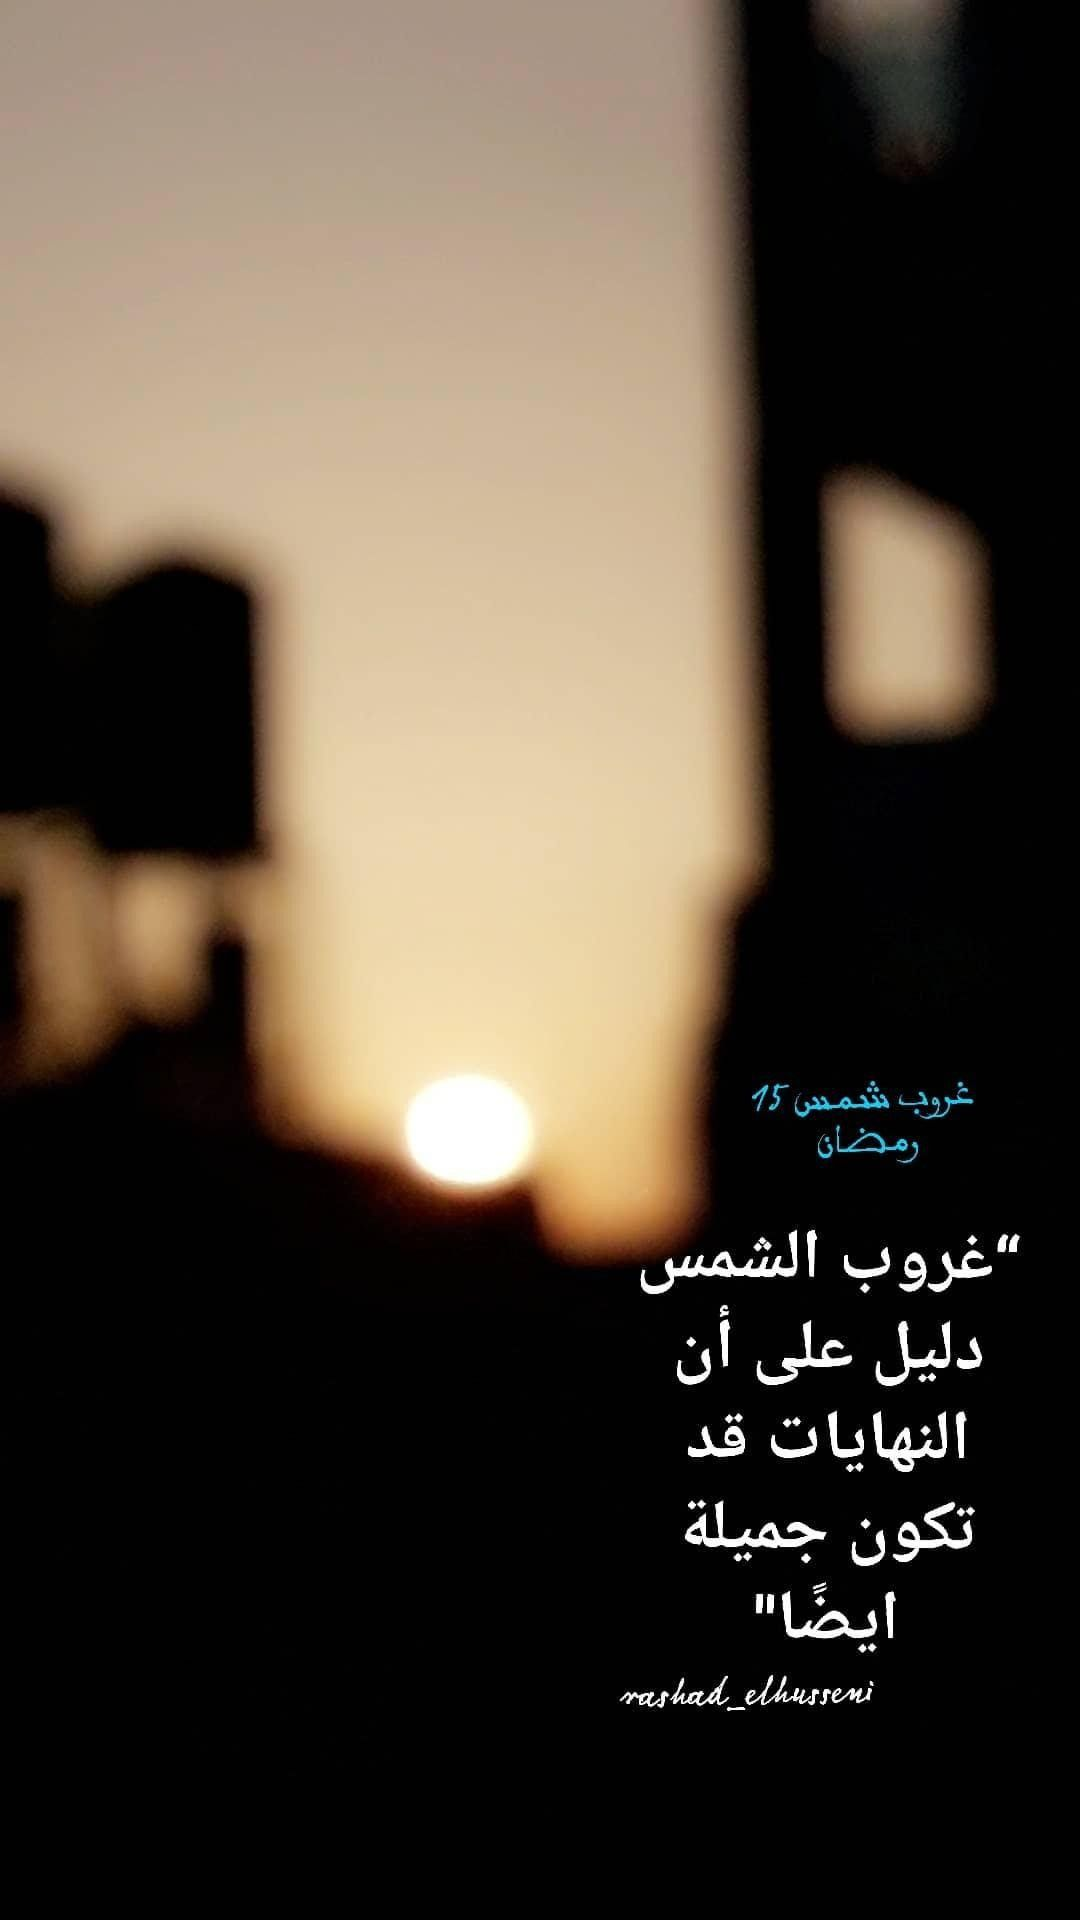 غروب الشمس Arabic Quotes Cards Against Humanity Lol